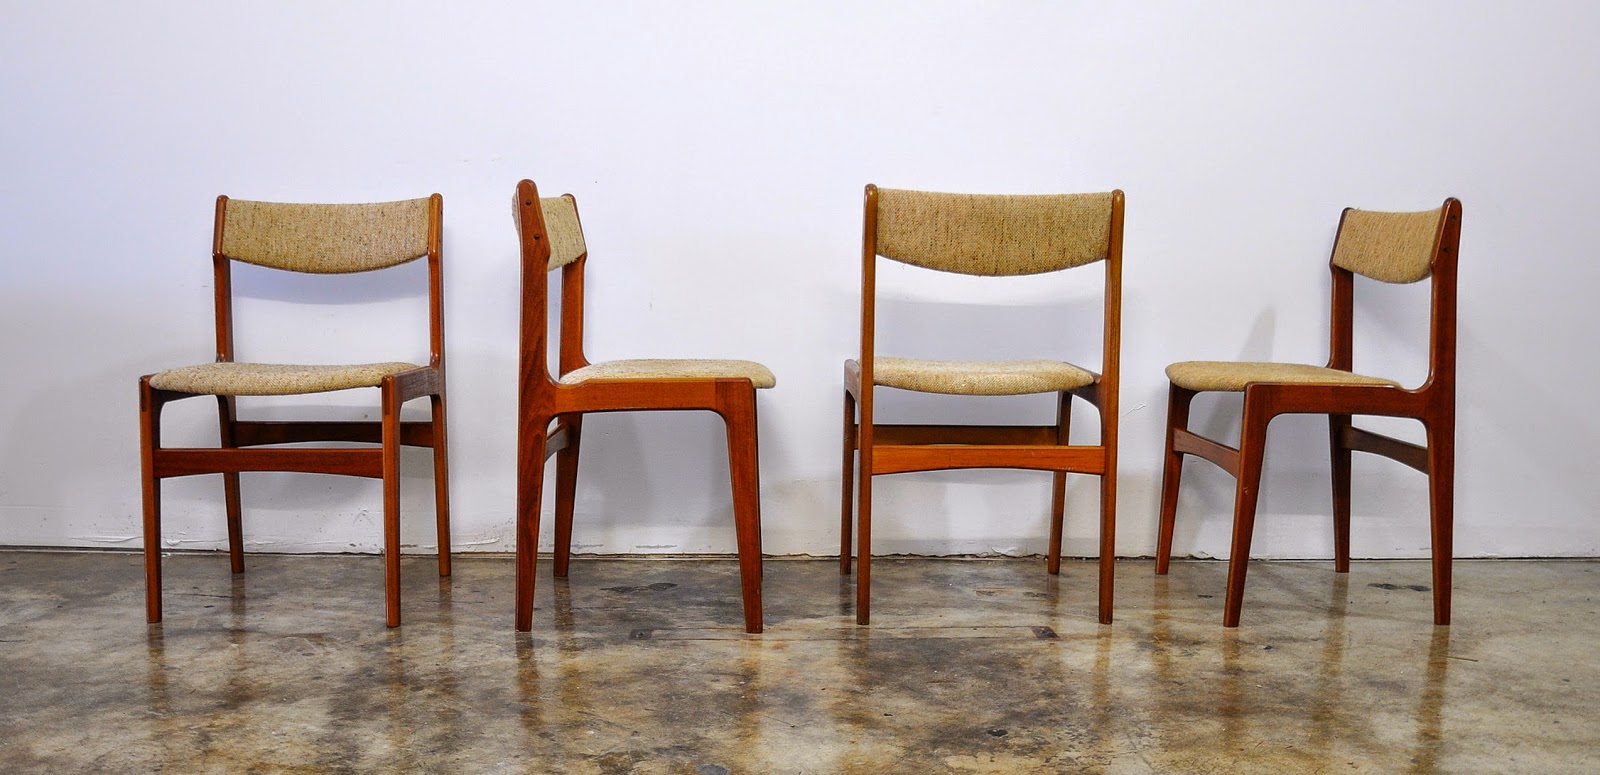 SELECT MODERN: Set of 4 Danish Modern Teak Dining Chairs